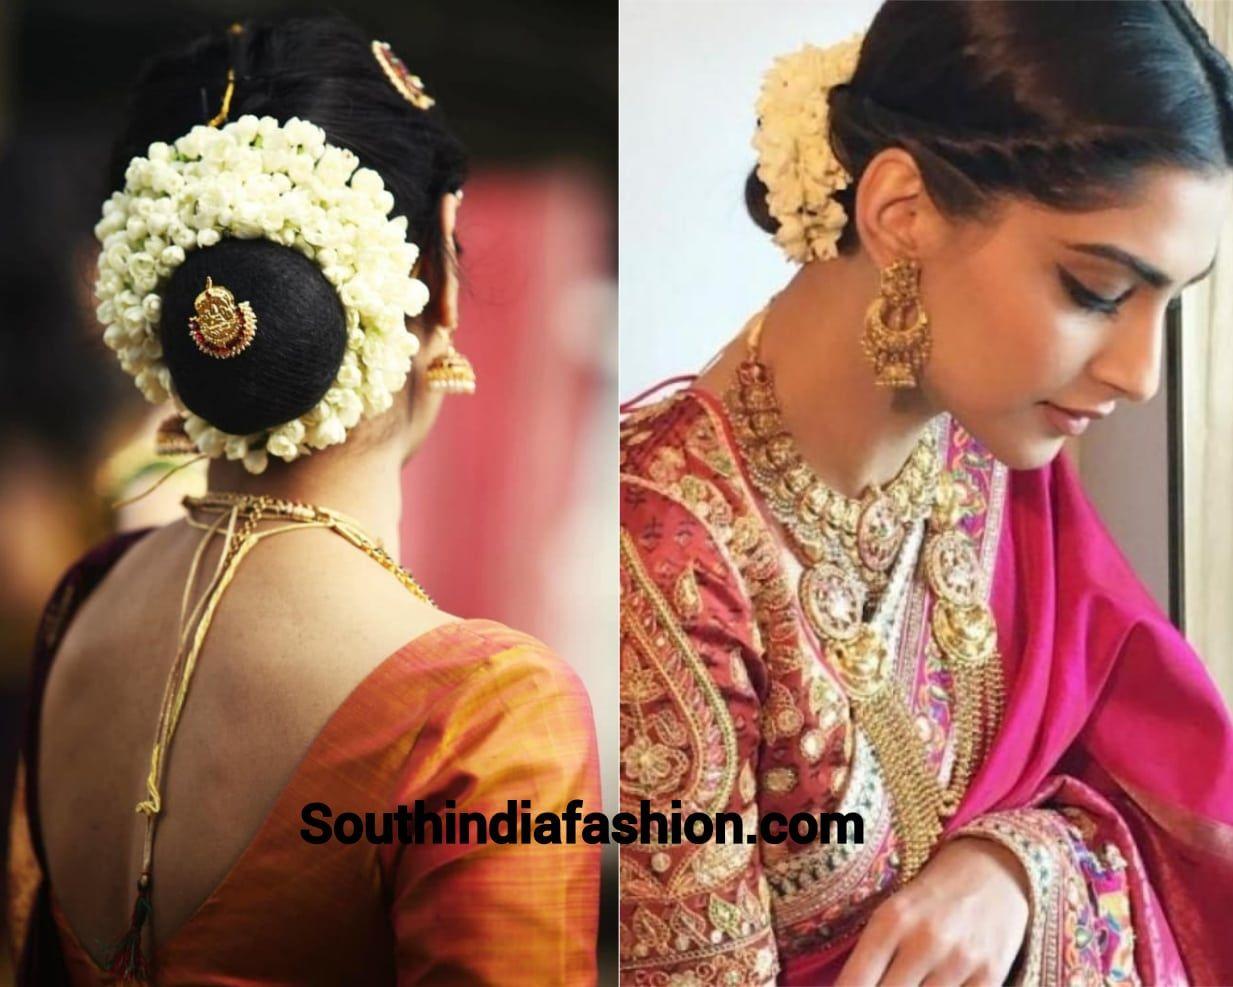 Indian Wedding Bun Hairstyle With Flowers And Gajra Bridal Hair Buns Bridal Bun Bun Hairstyles